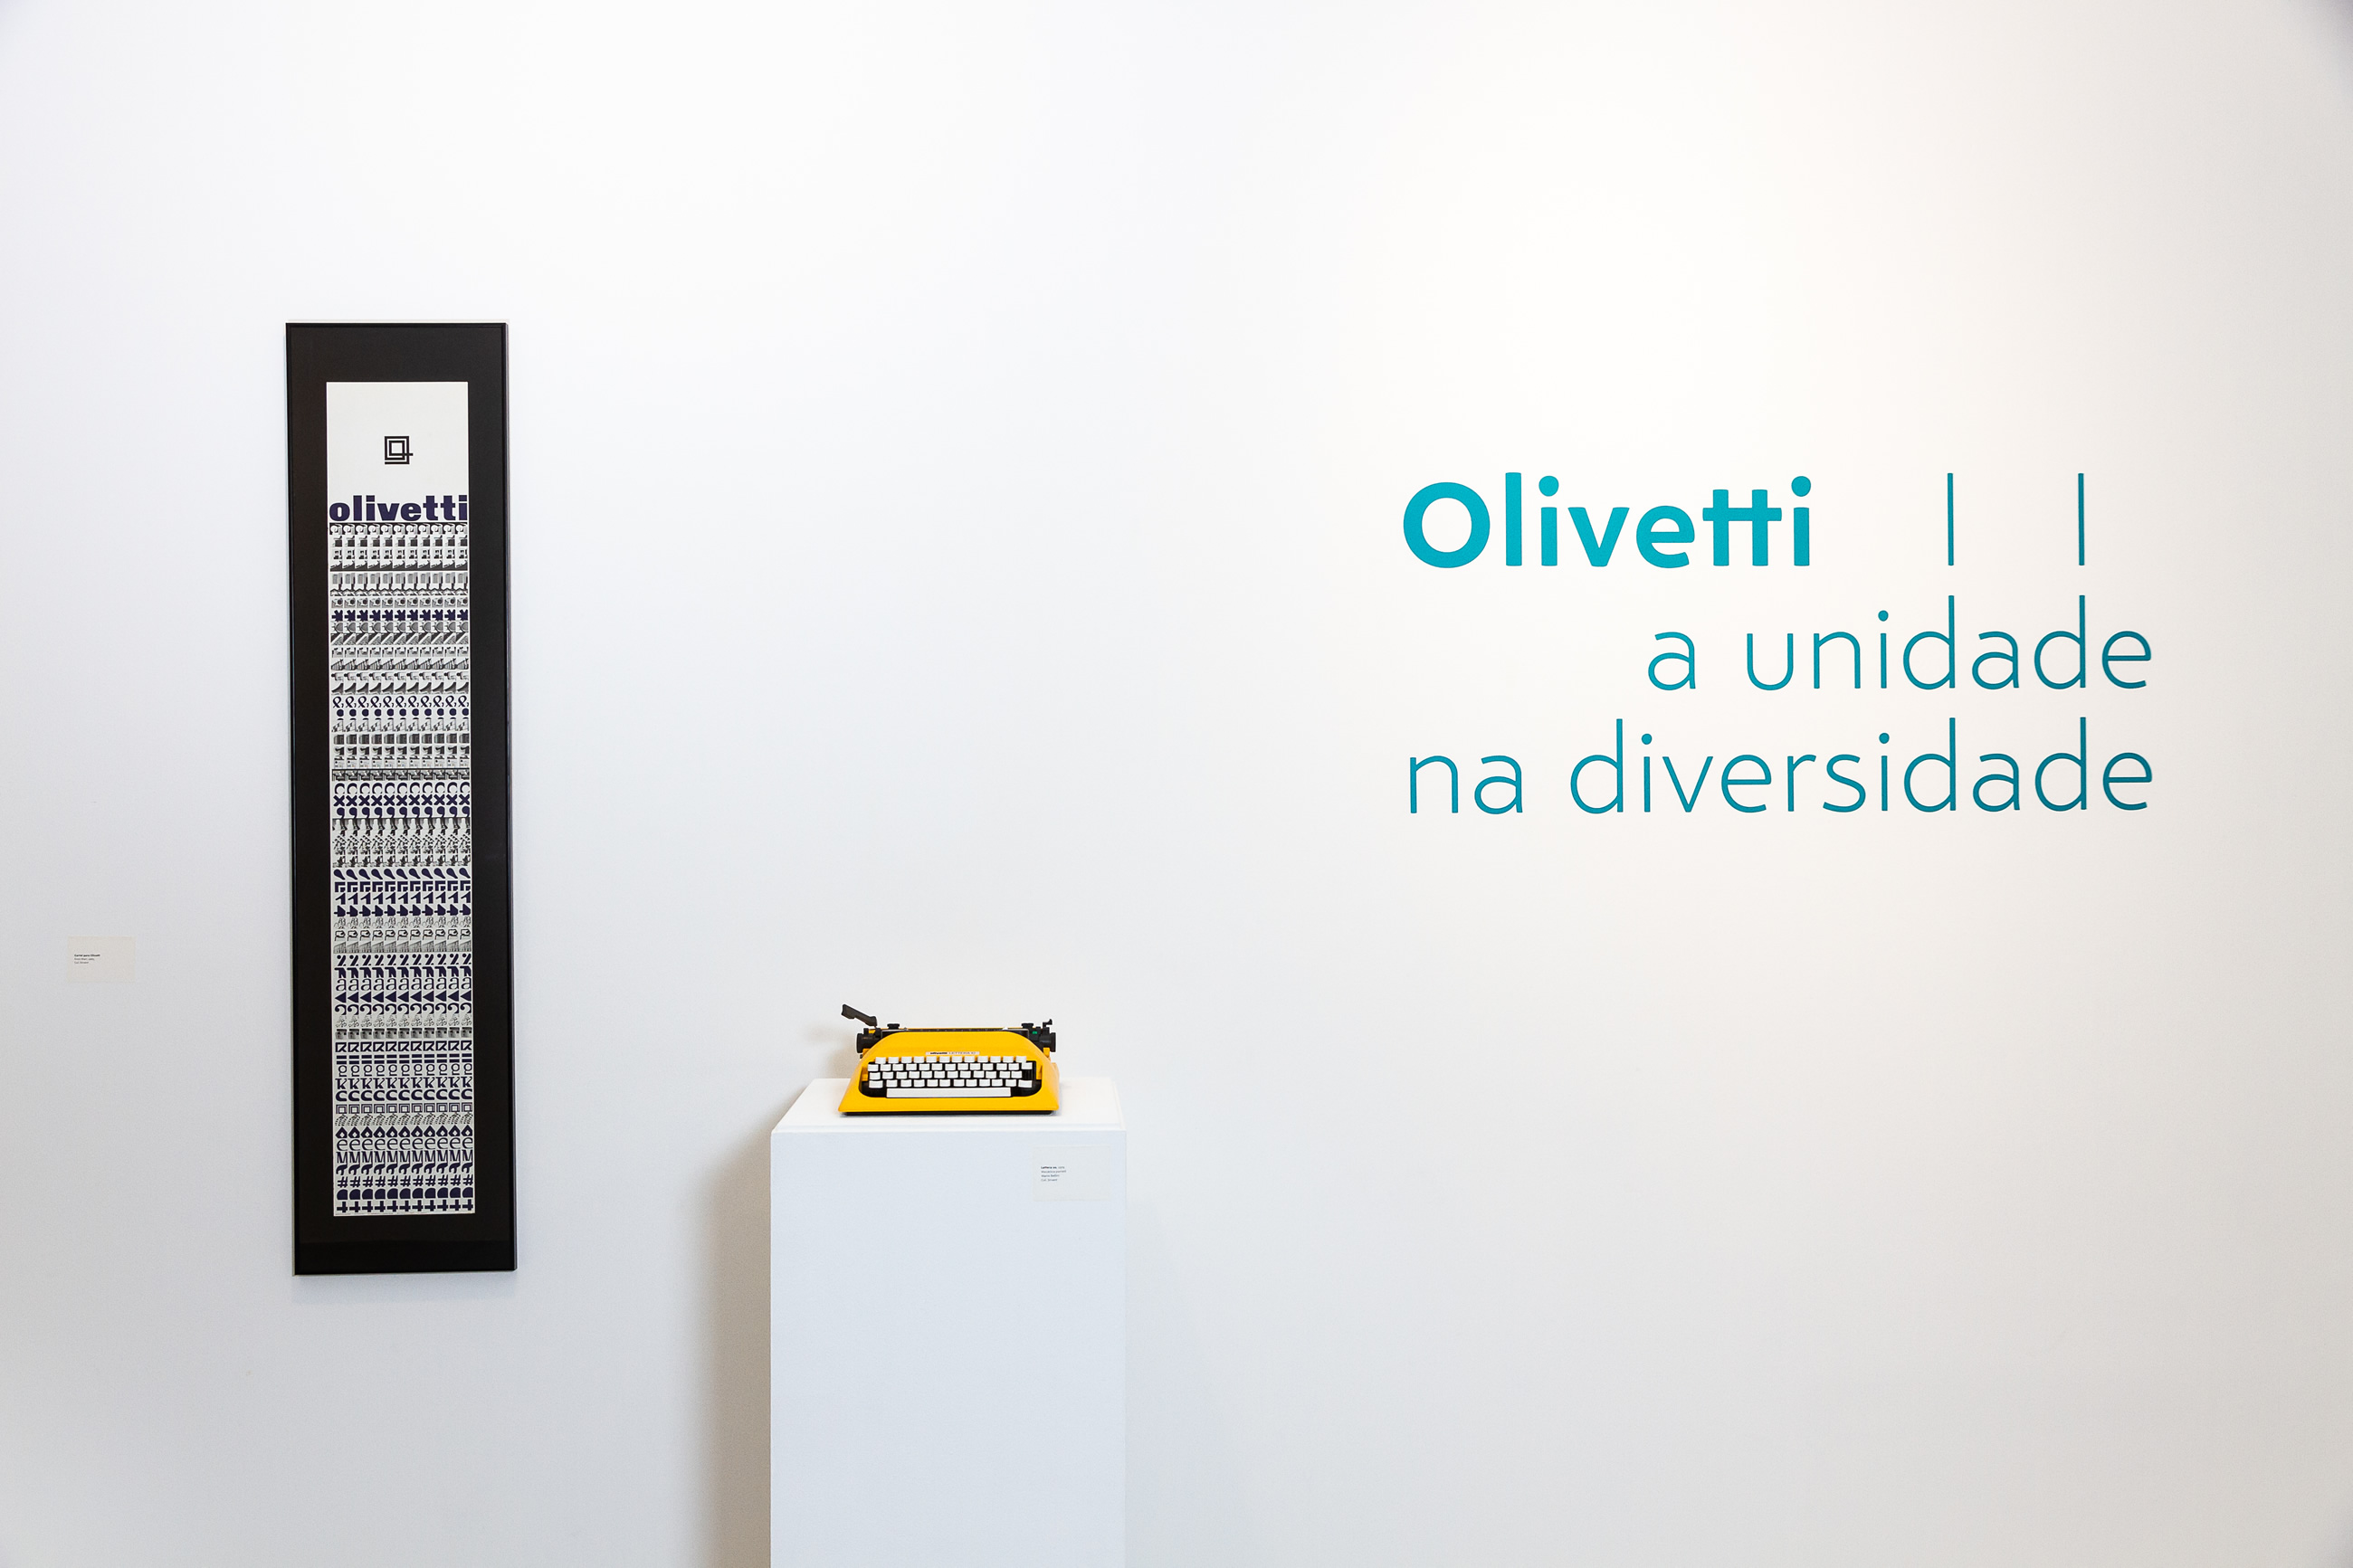 Olivetti. A unidade na diversidade